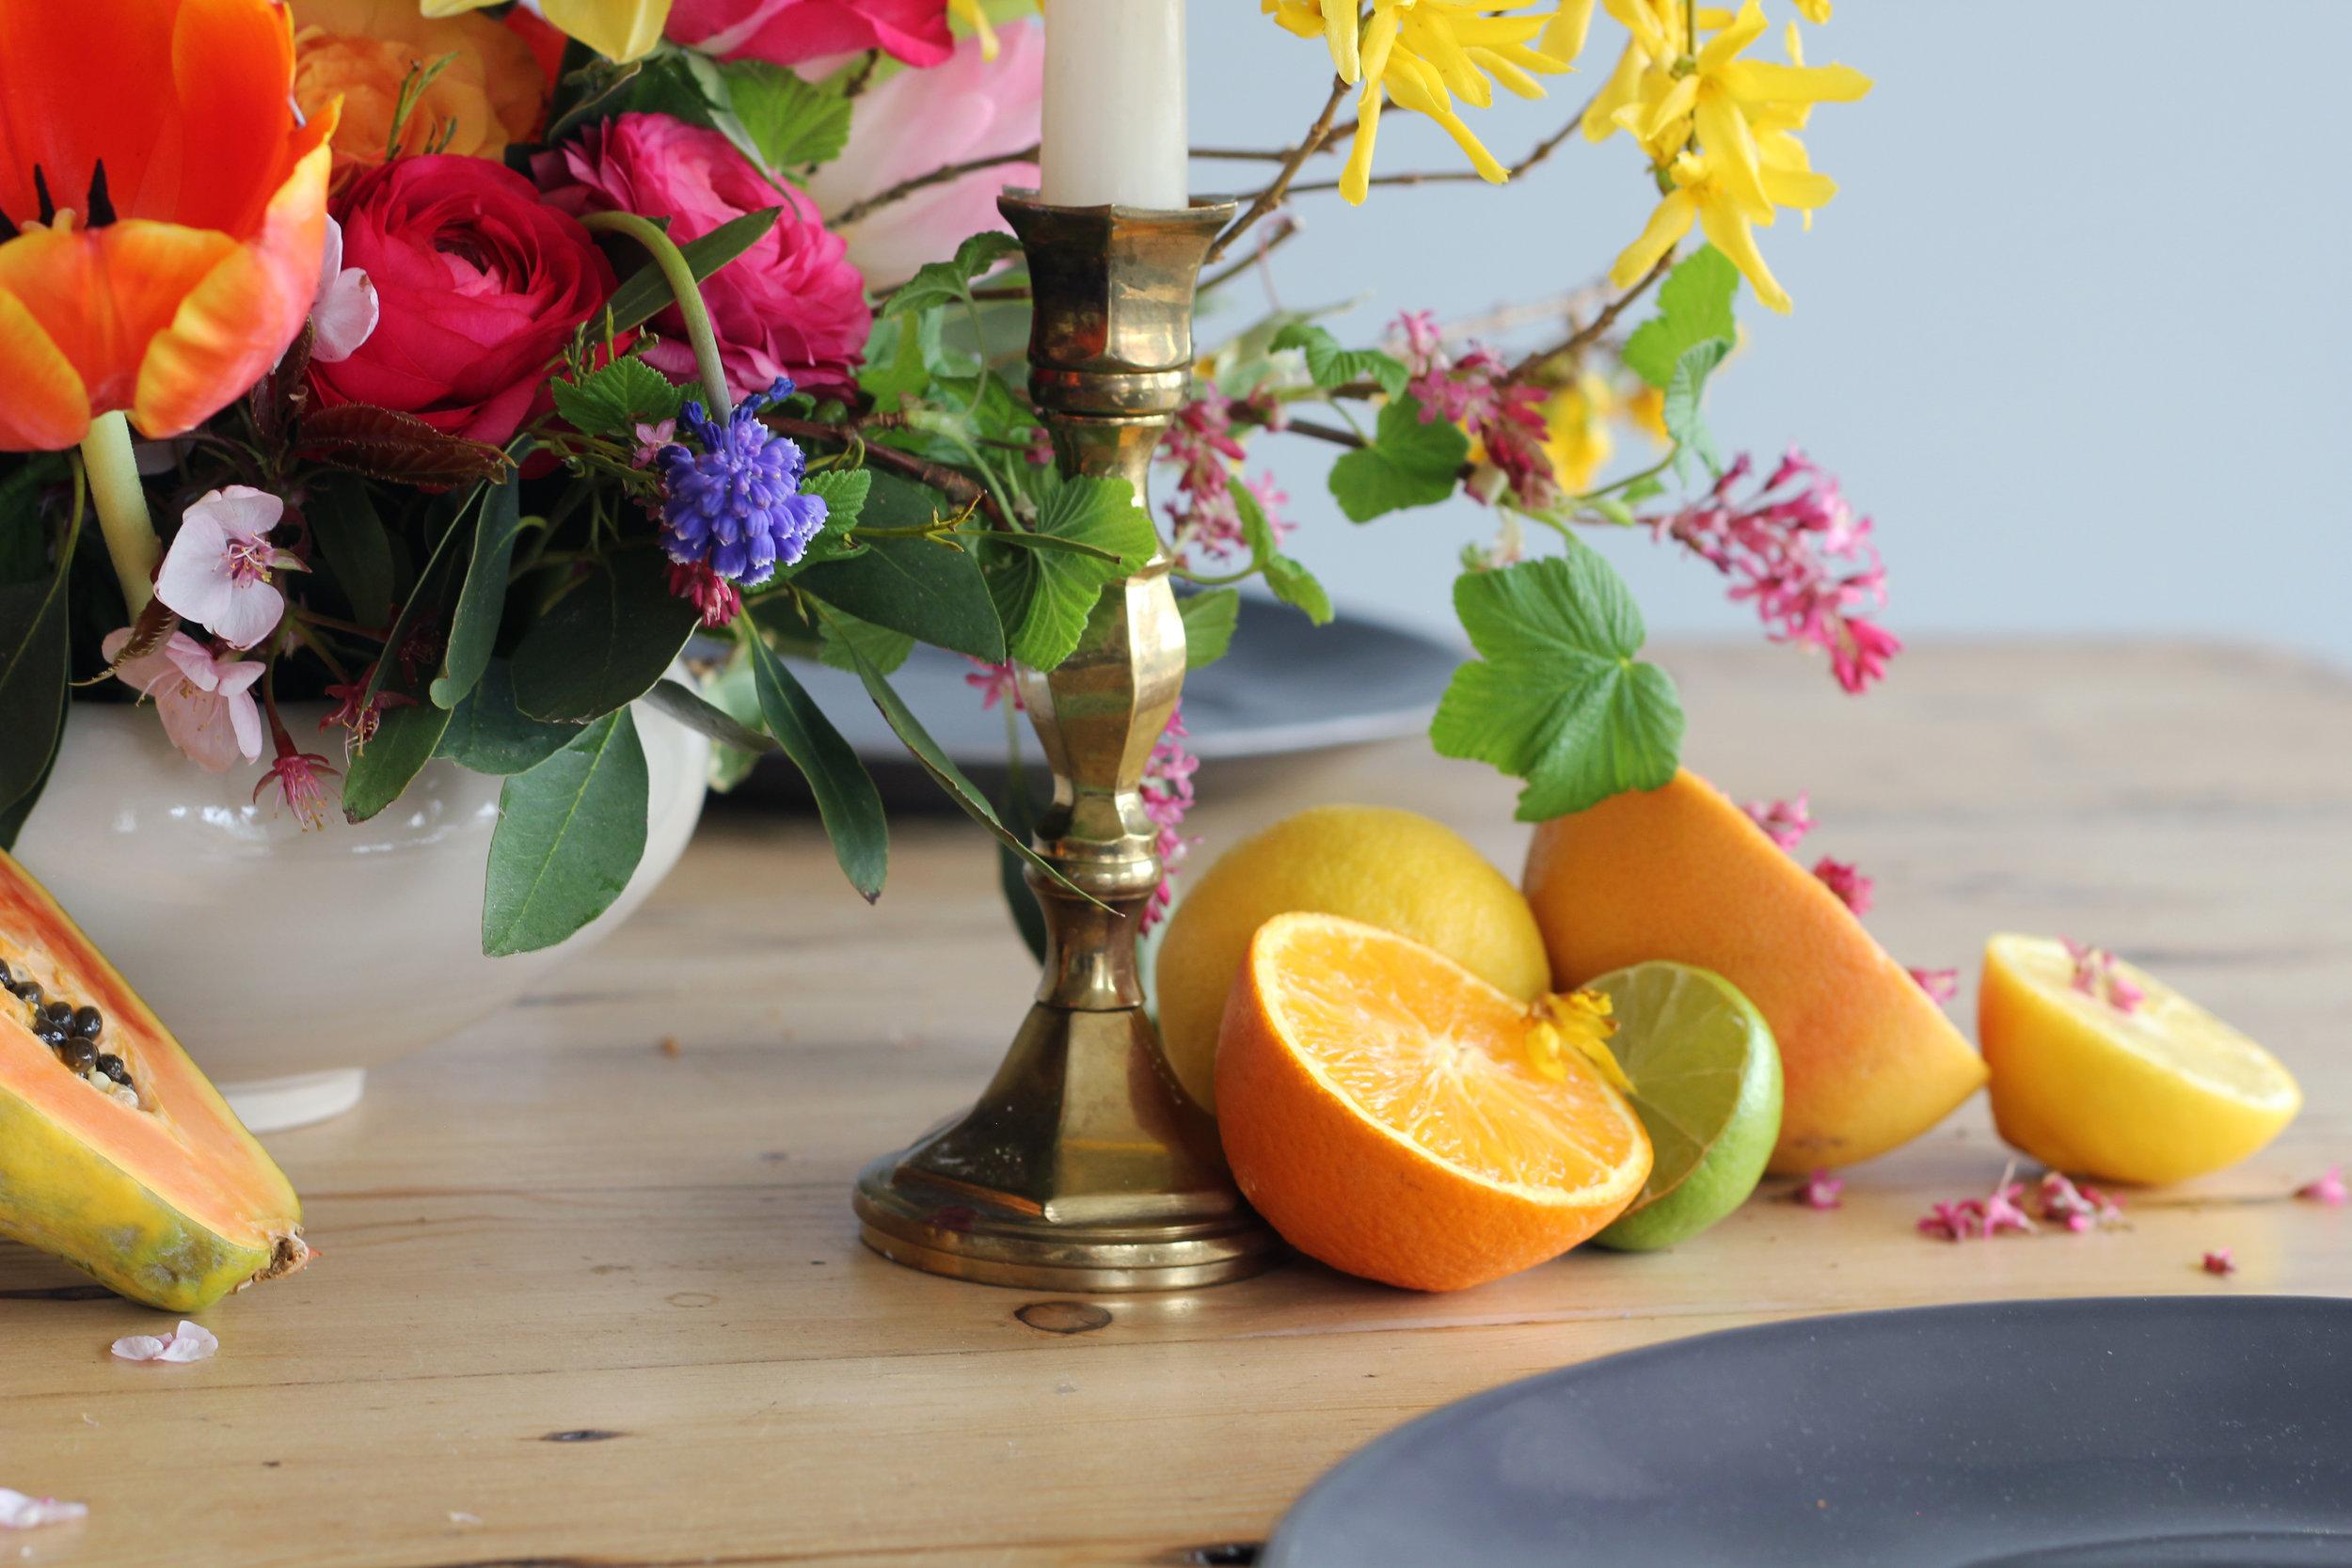 Callie-Pettigrew-Fruity-Florals-24.jpg